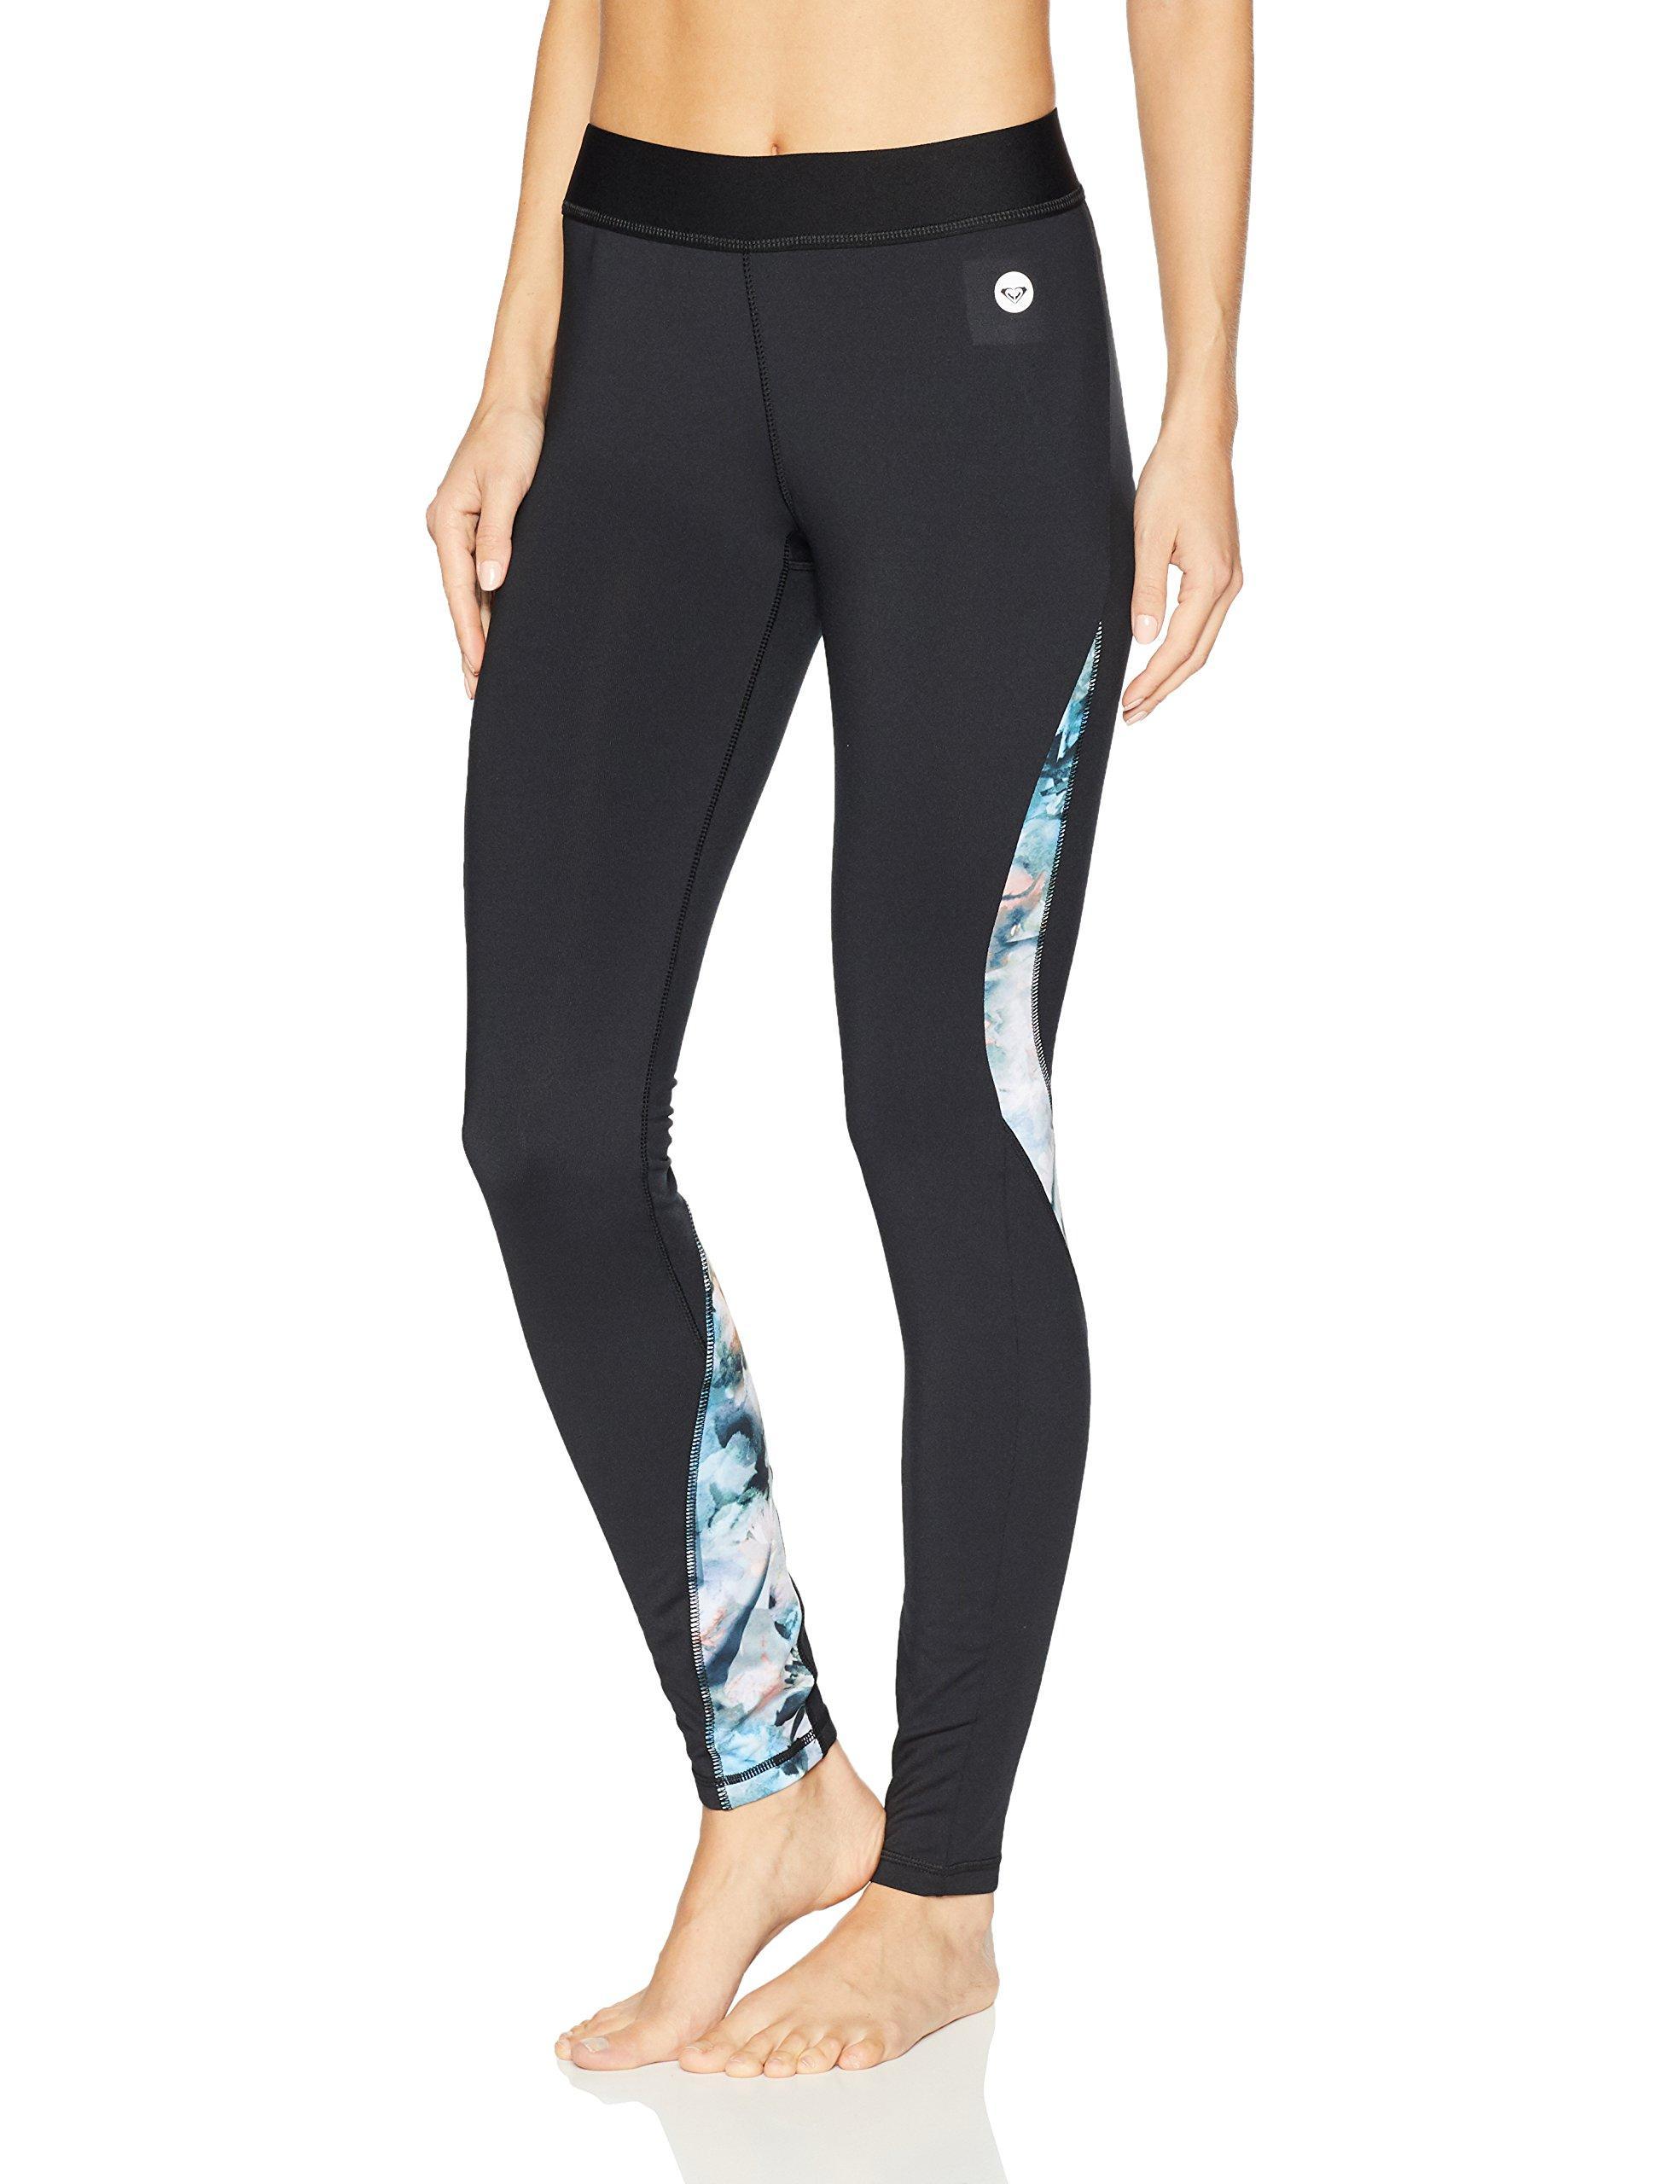 Roxy Womens Kalanka Capri Workout Pant